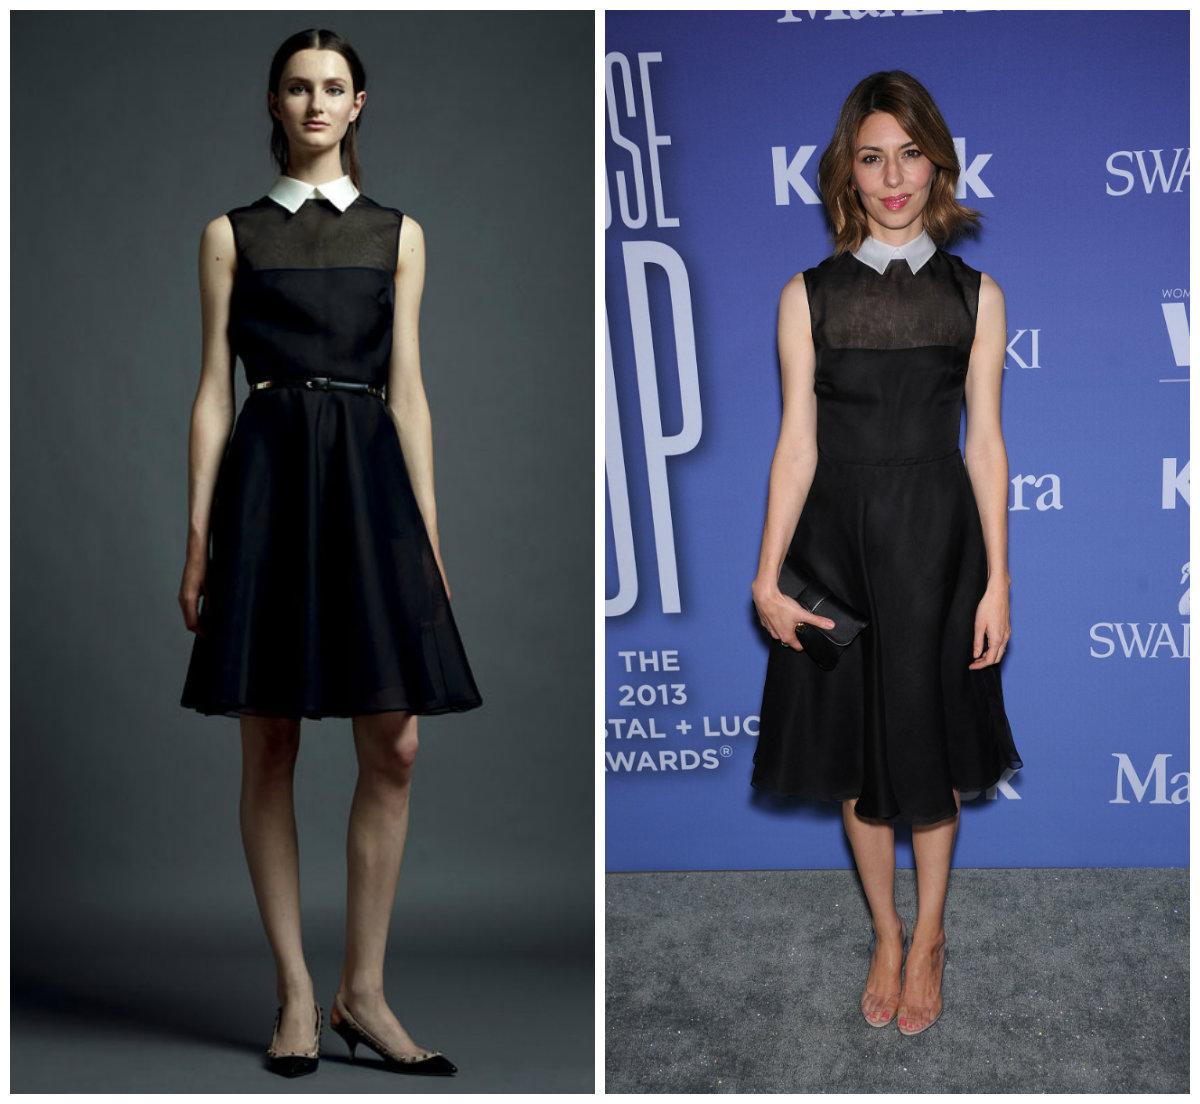 Sofia Coppola aux Women In Film Crystal + Lucy Awards en portant une robe noire courte de Valentino